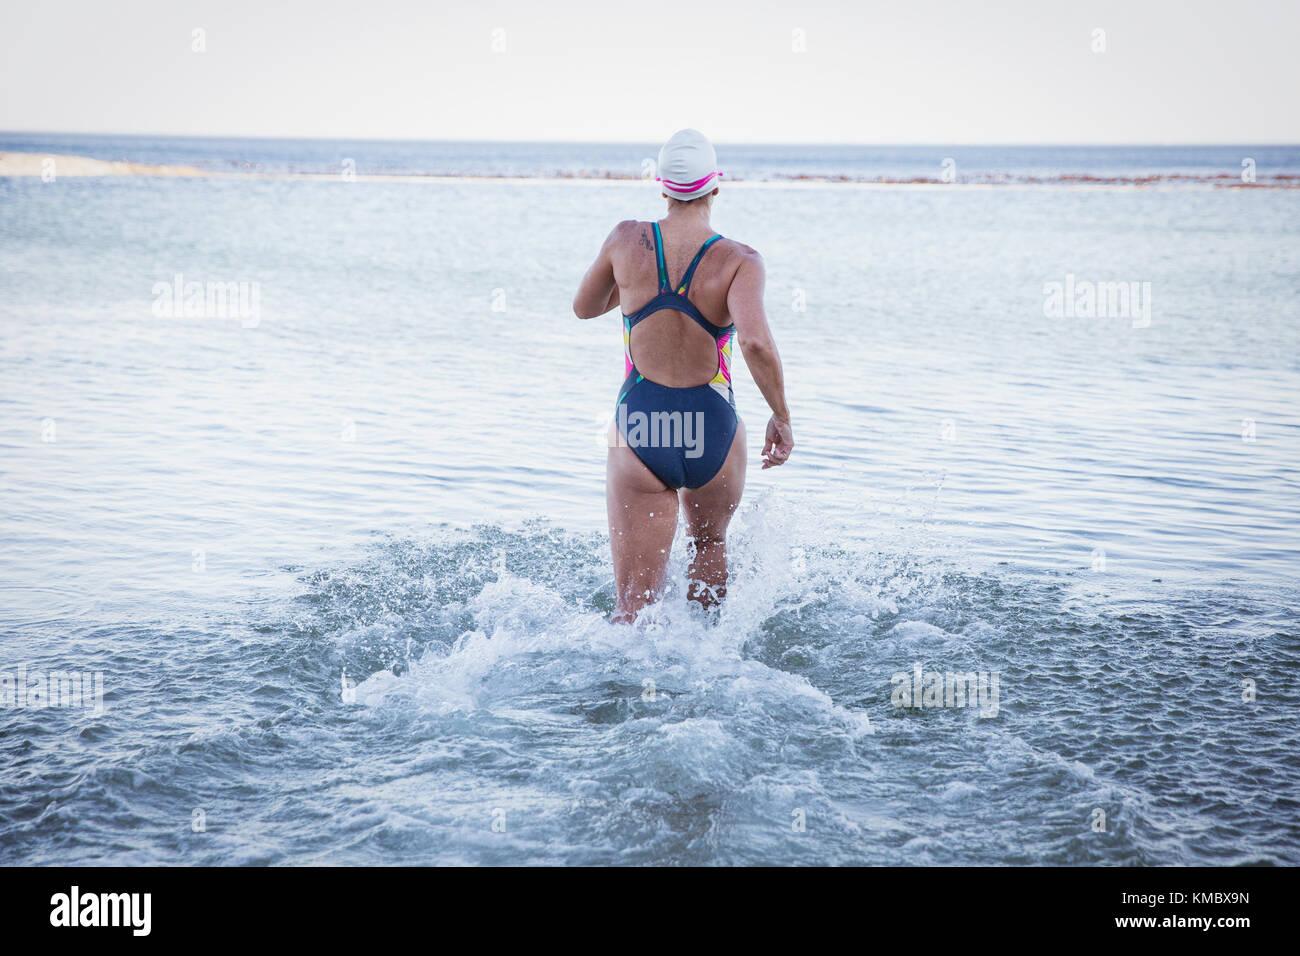 Femmina acqua aperta nuotatore in esecuzione in ocean surf Immagini Stock